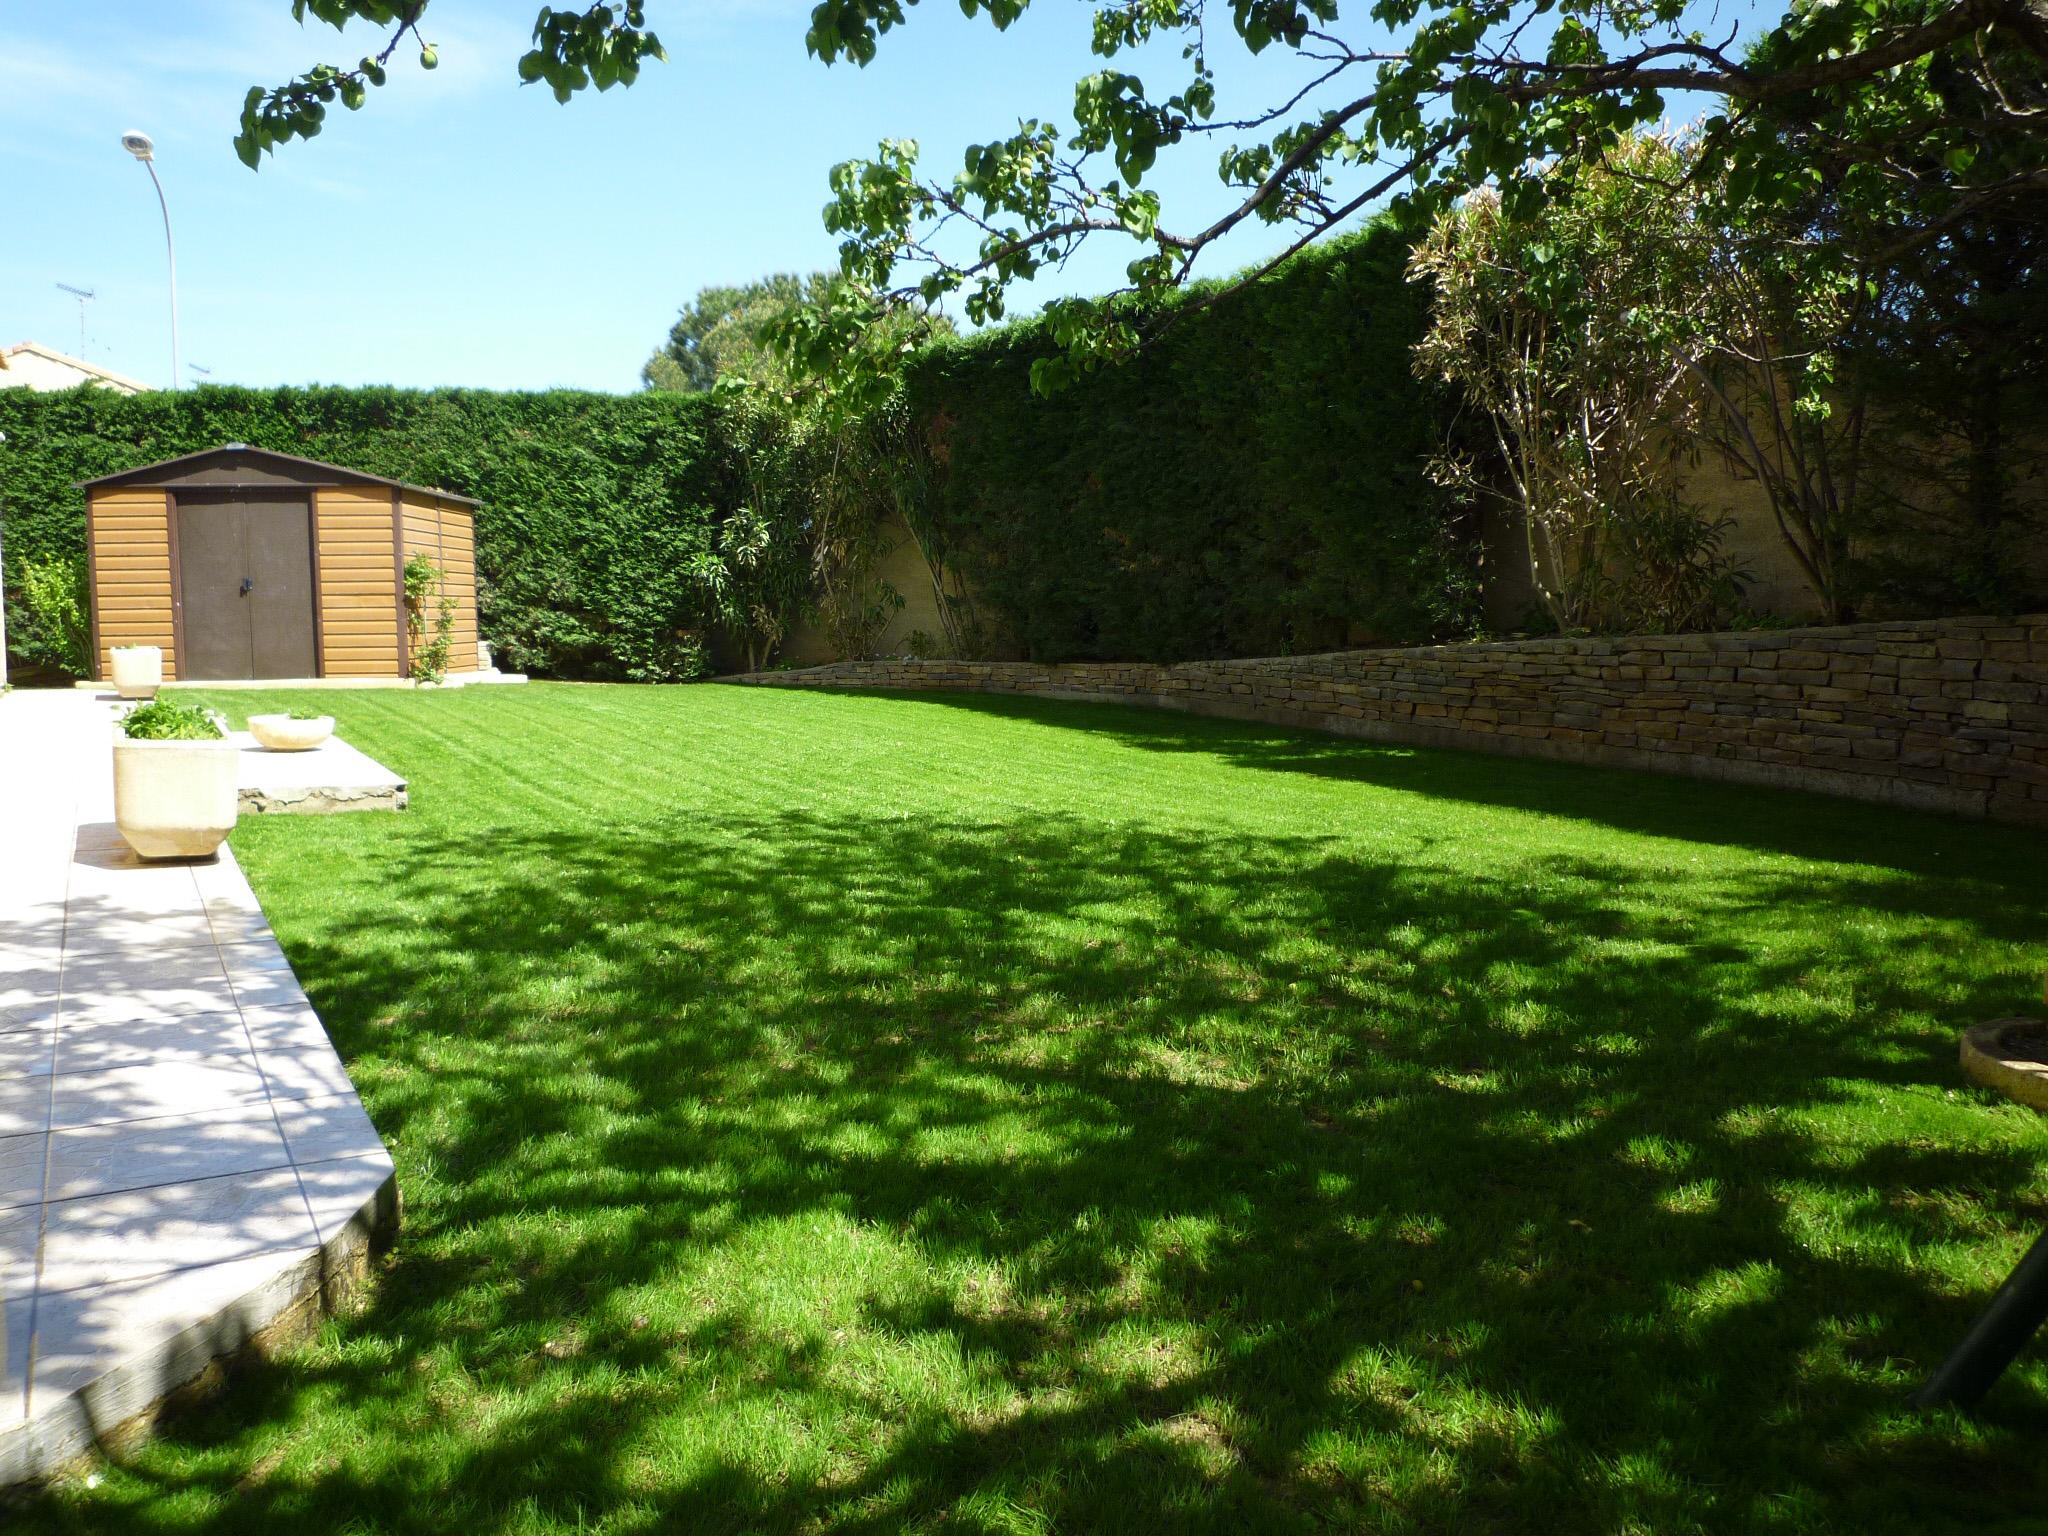 Jardins evasion paysagiste jardins evasion for Entretien jardin montpellier